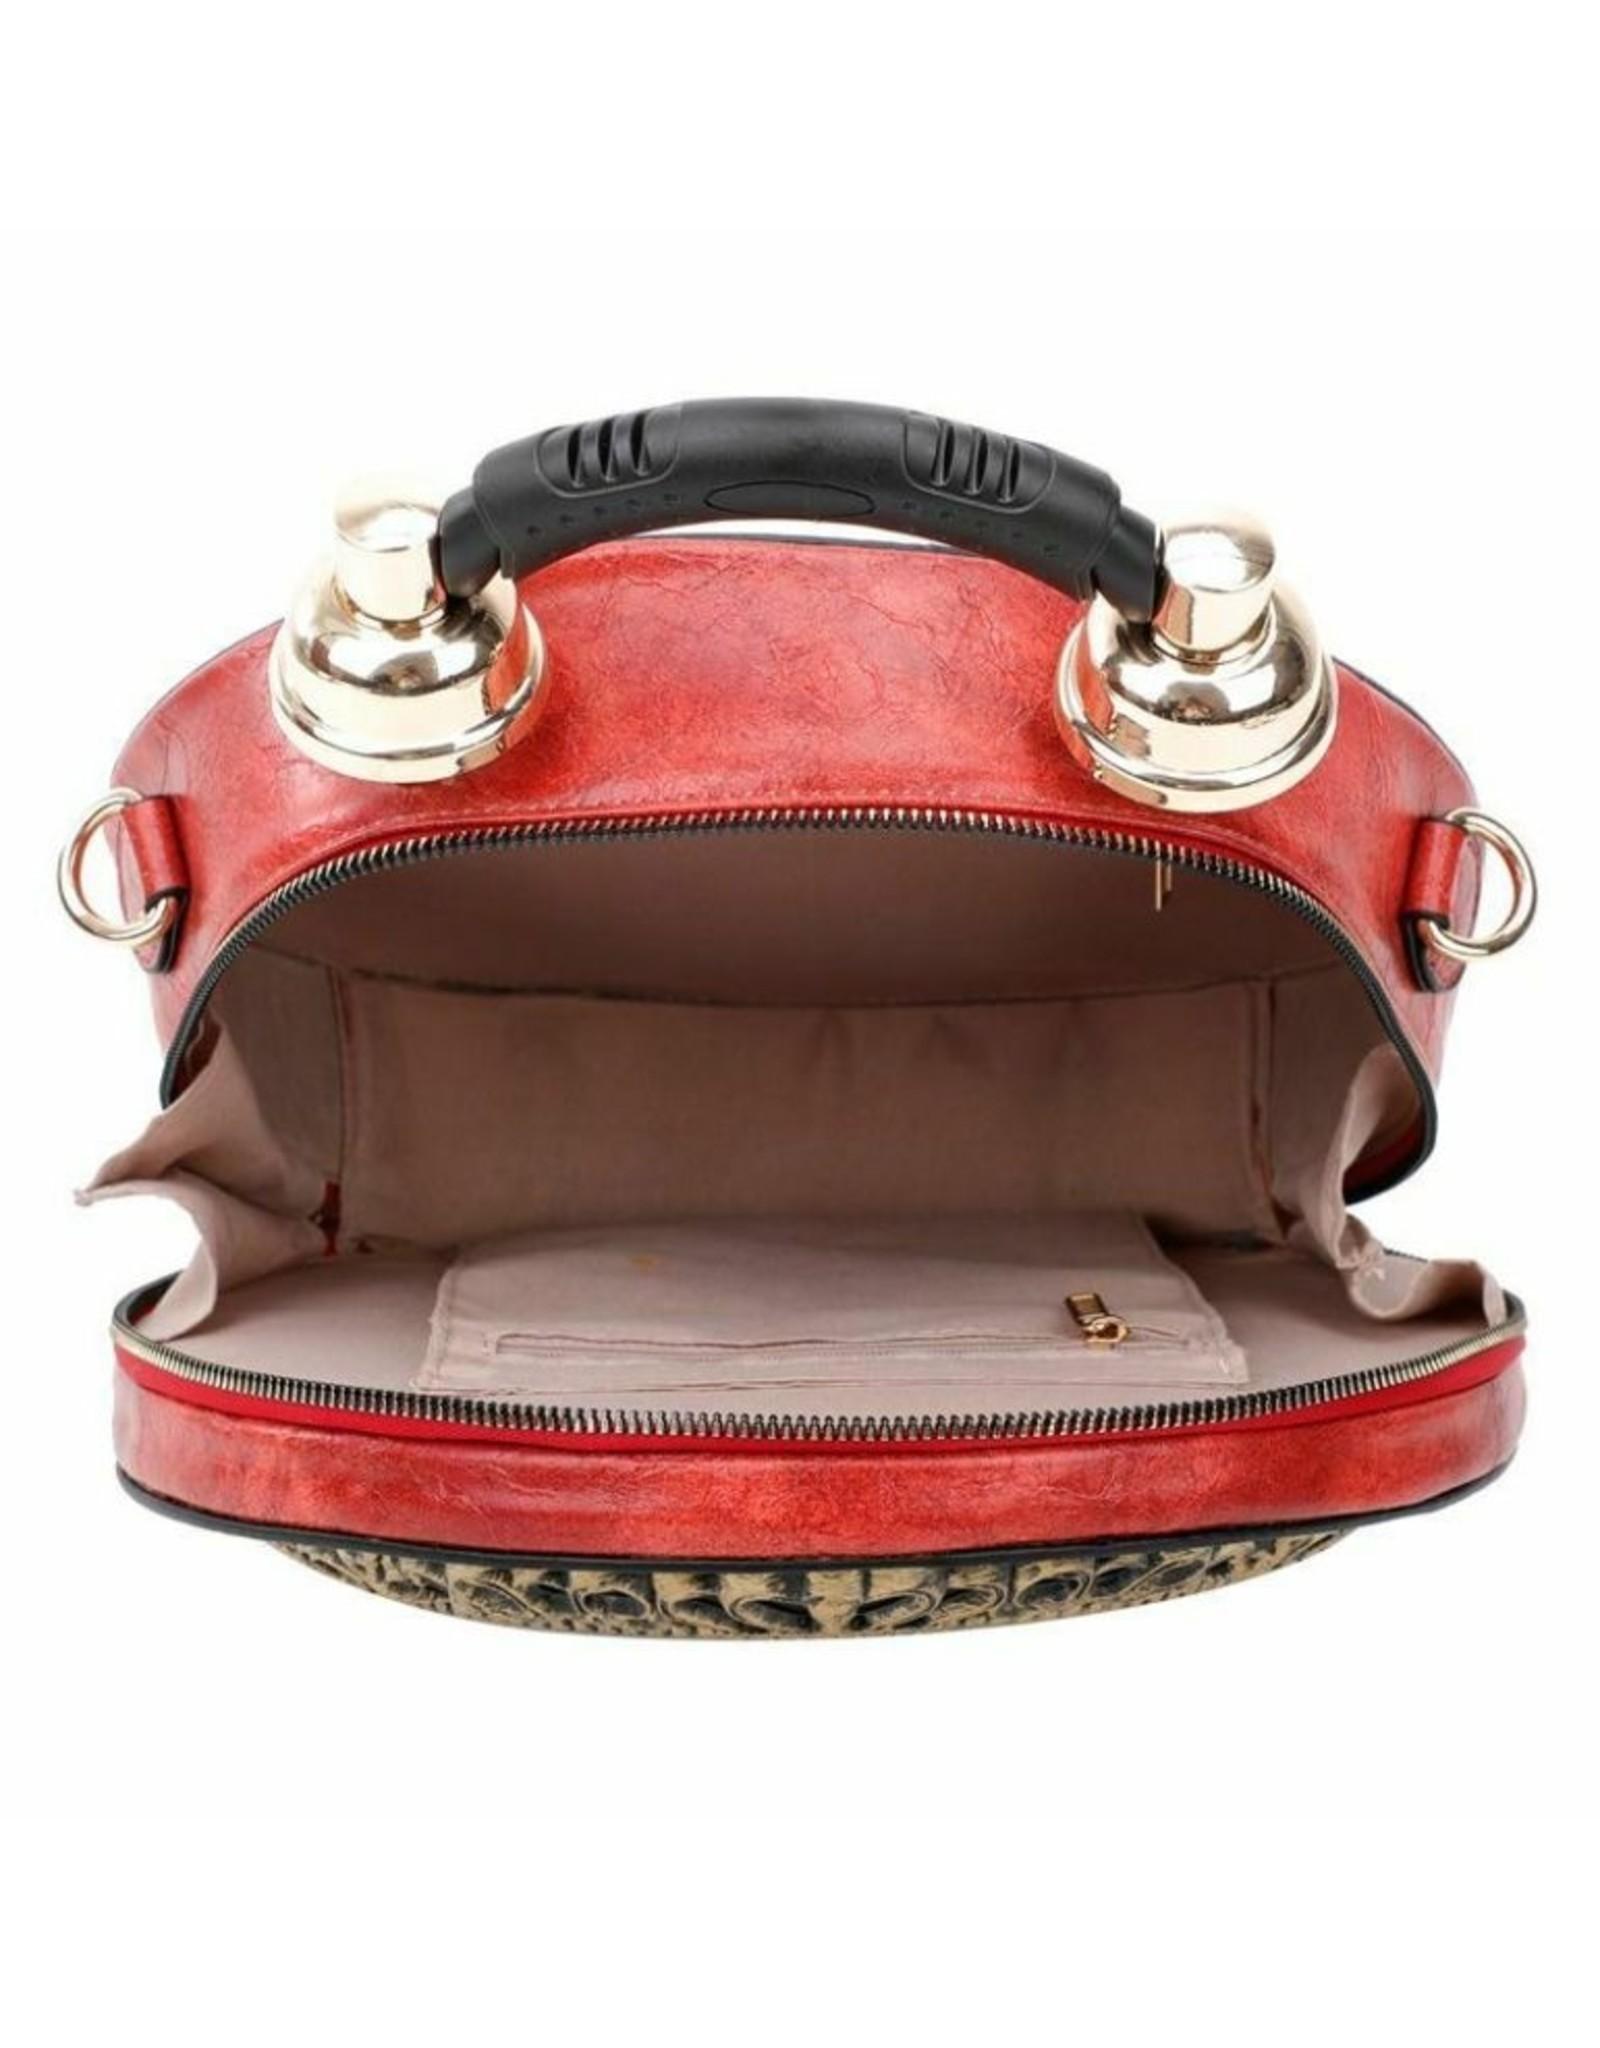 Magic Bags Steampunk tassen Gotic tassen - Handtas met Echte Klok bruin (medium)